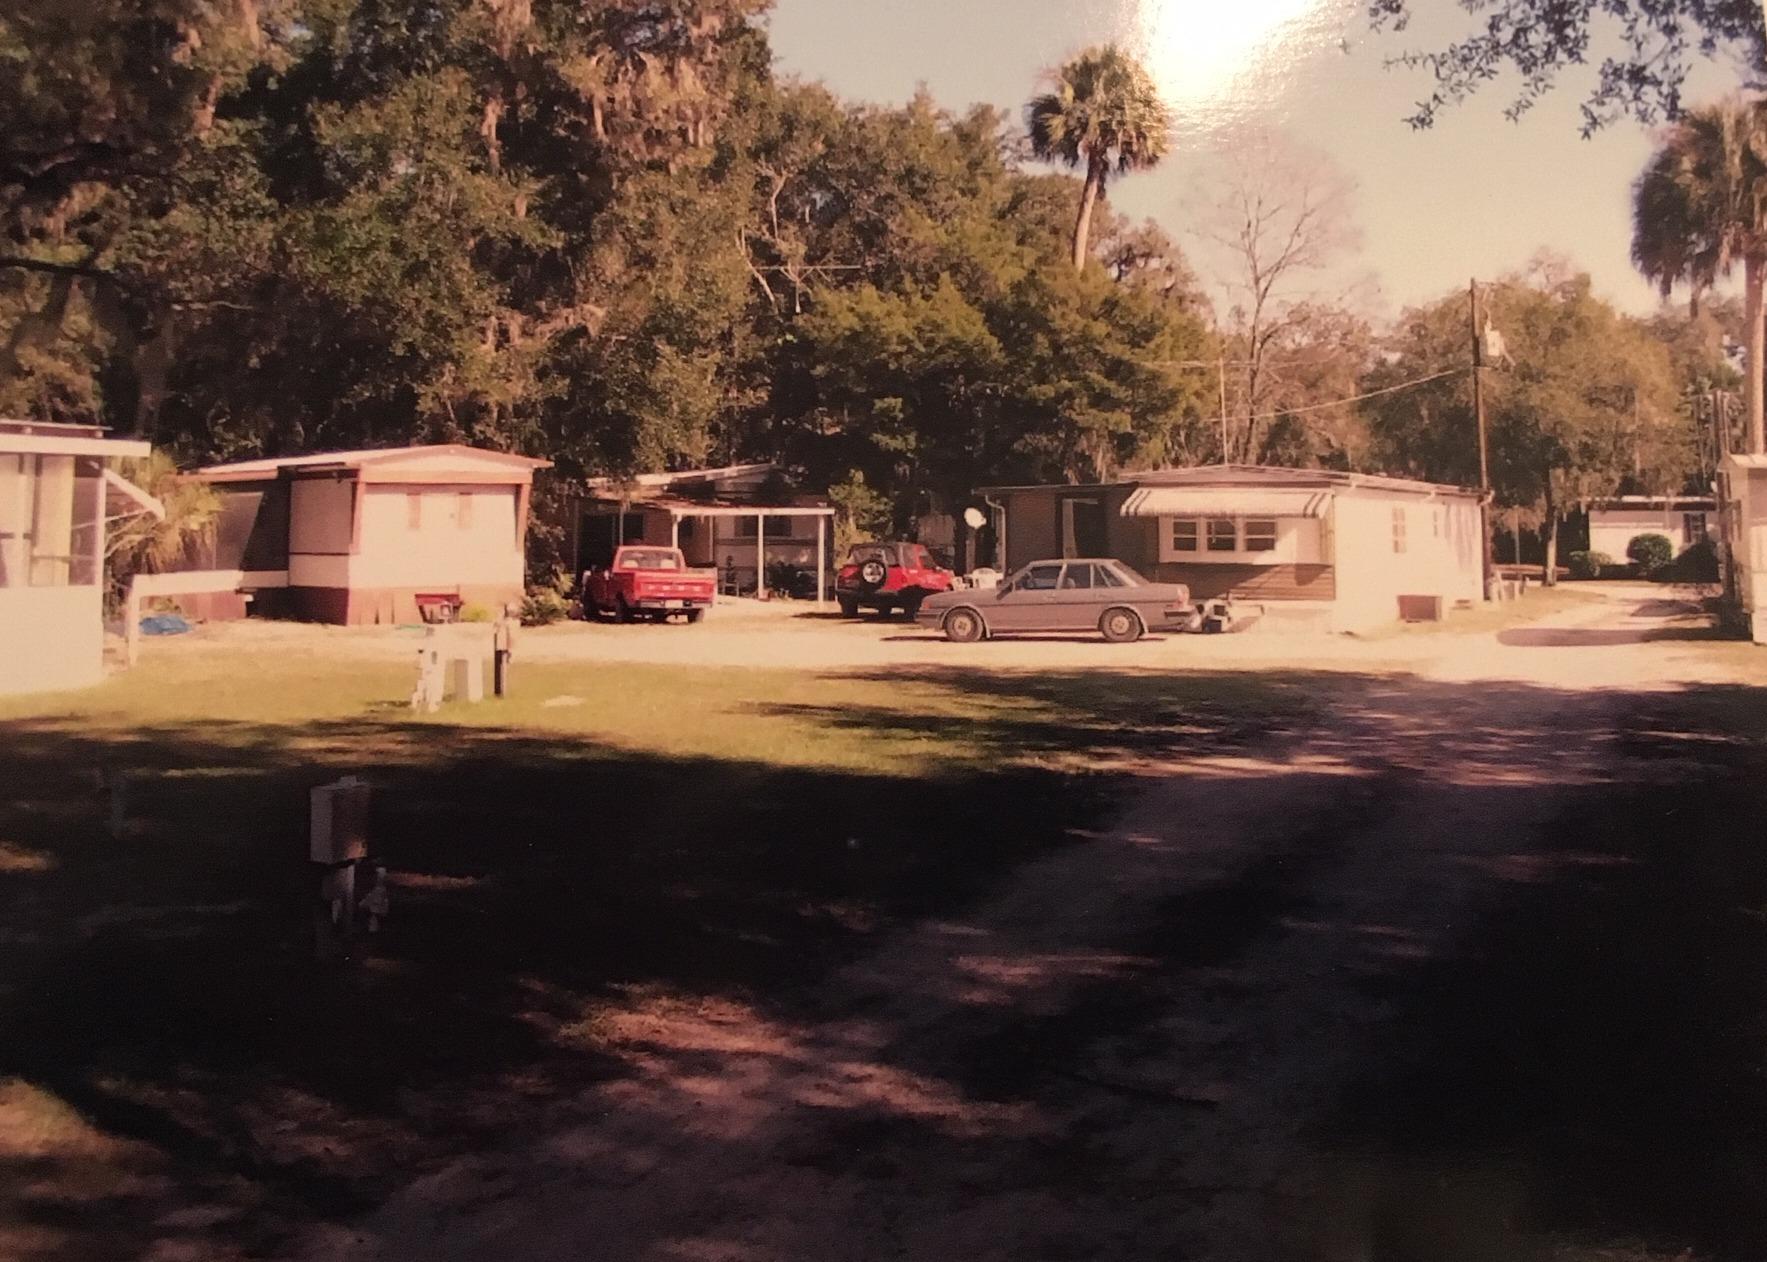 The trailer park